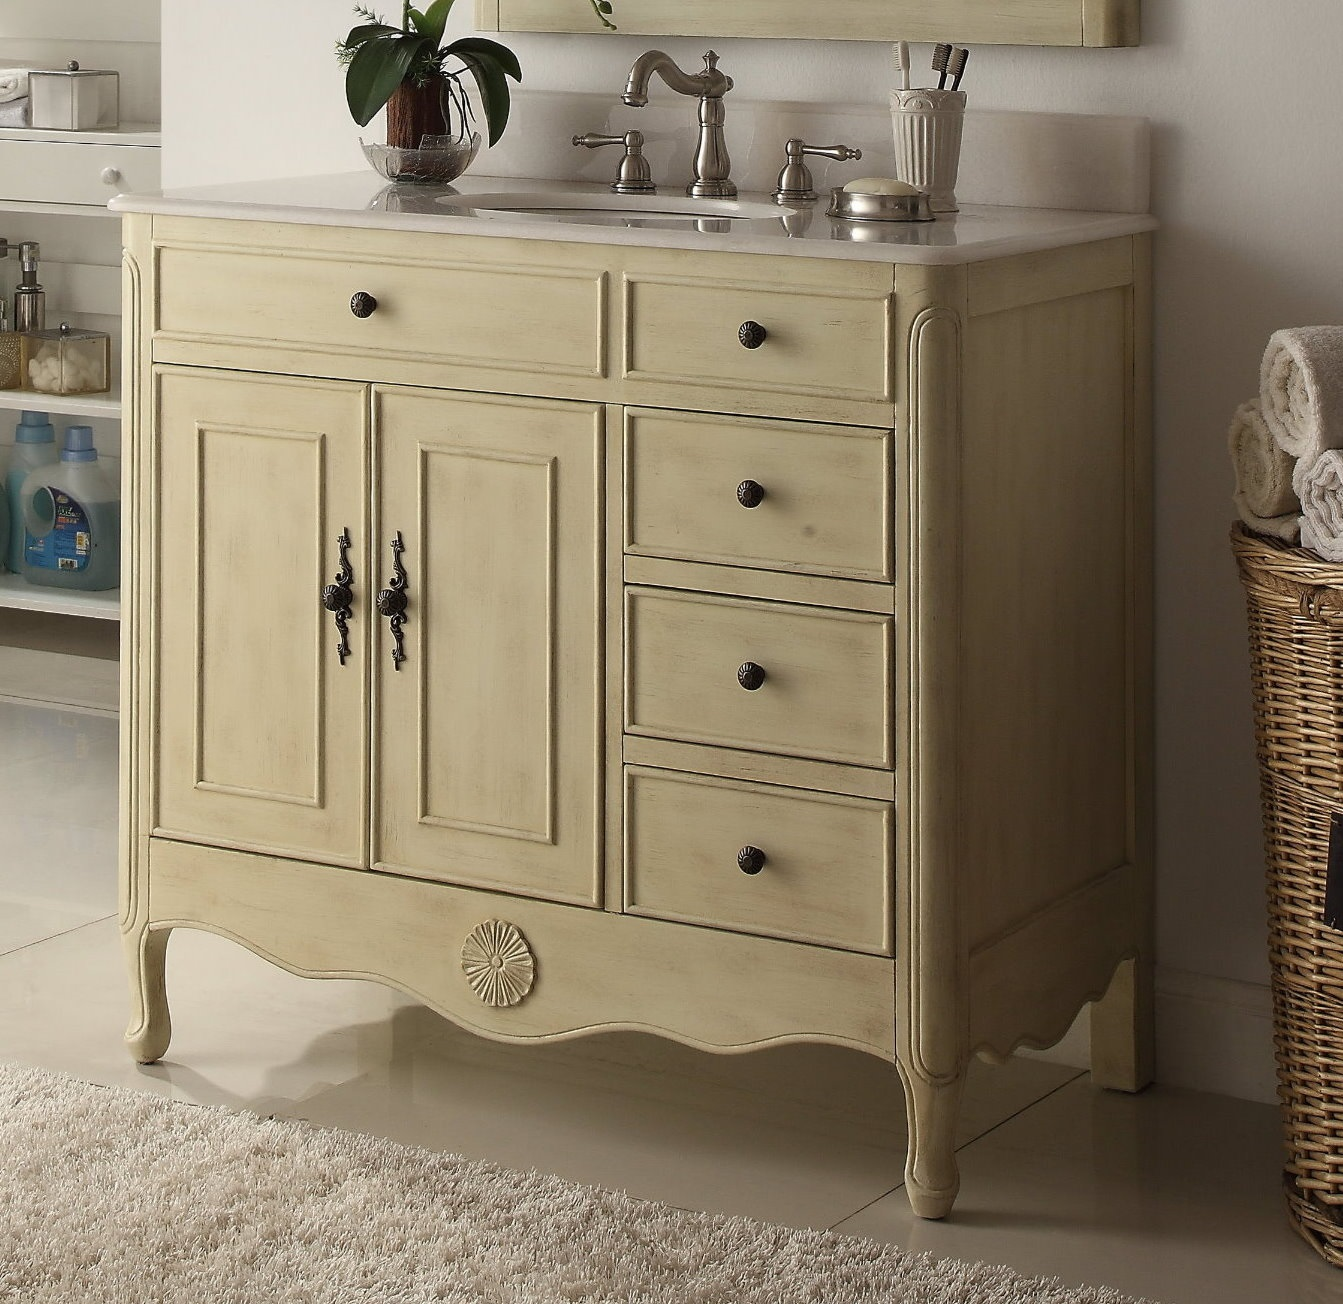 "Adelina 38"" Distressed Cream Bathroom Sink Vanity"